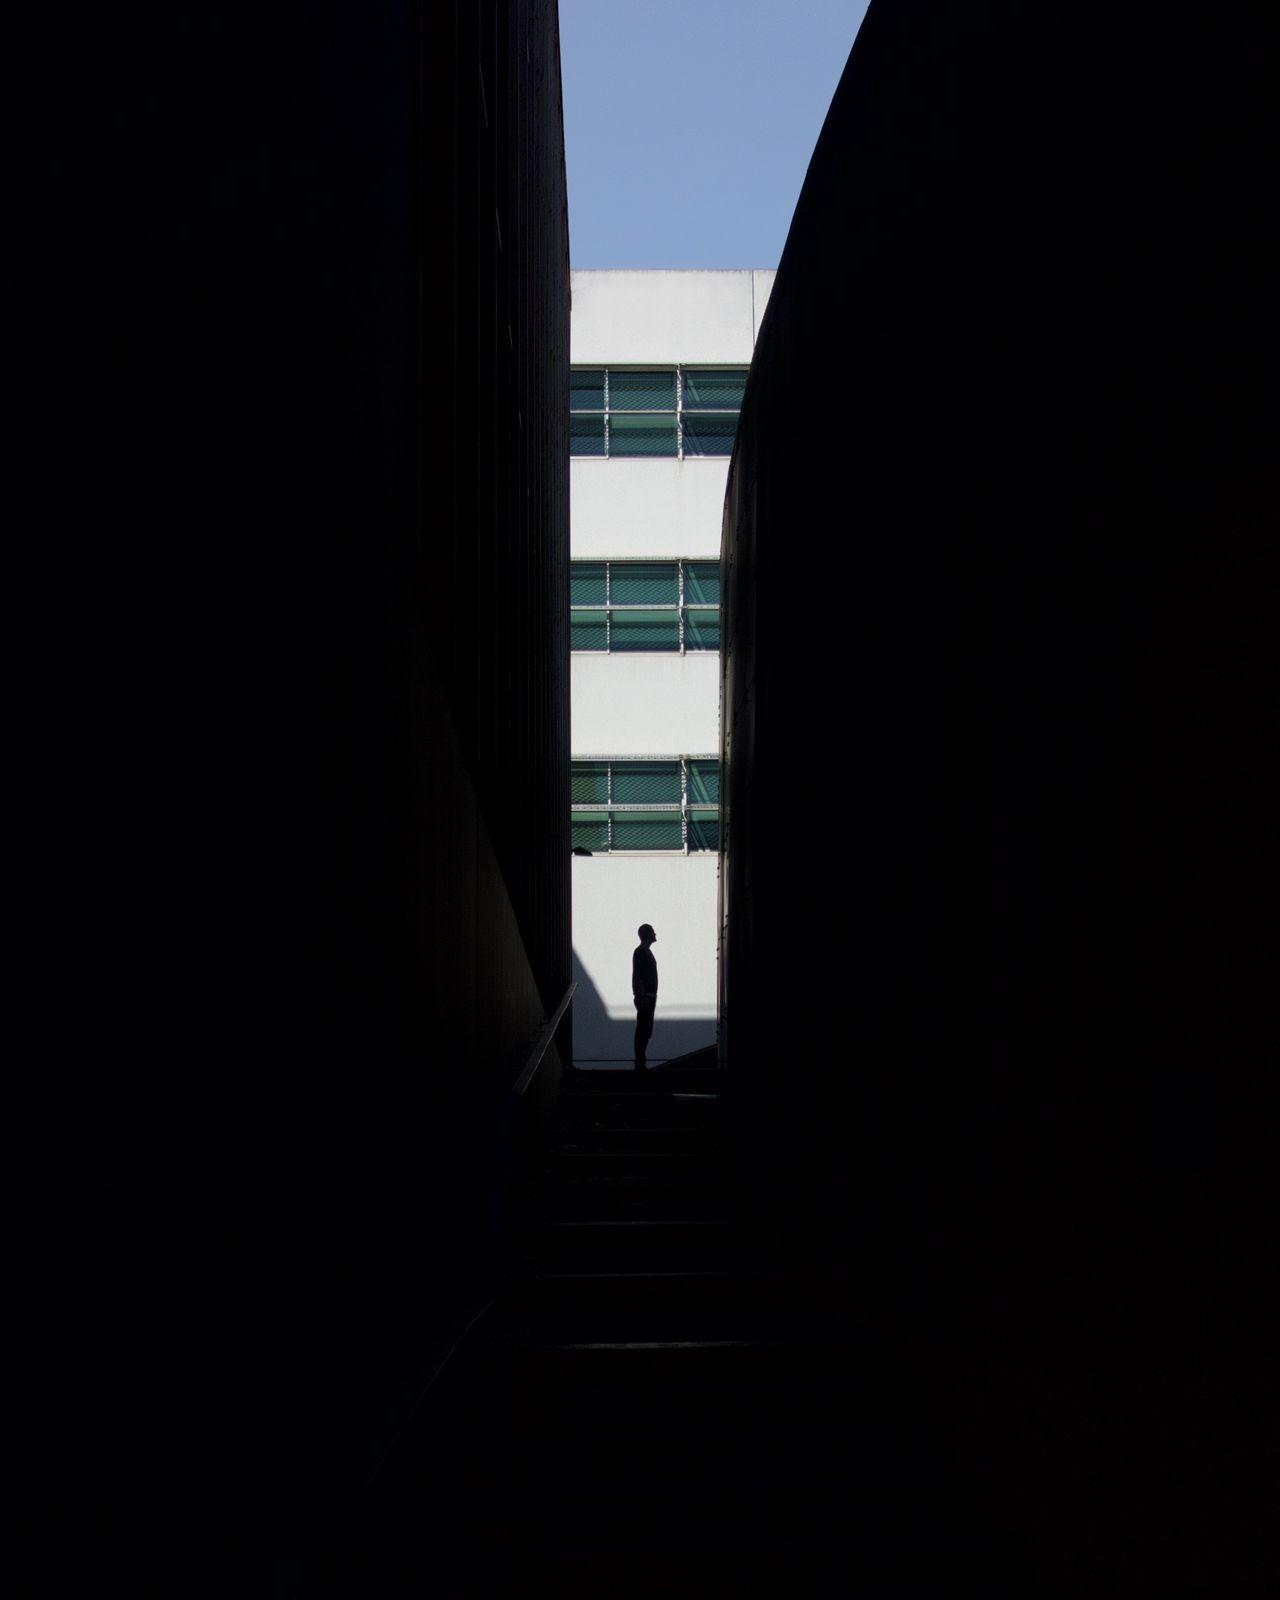 Silhouette man amidst buildings